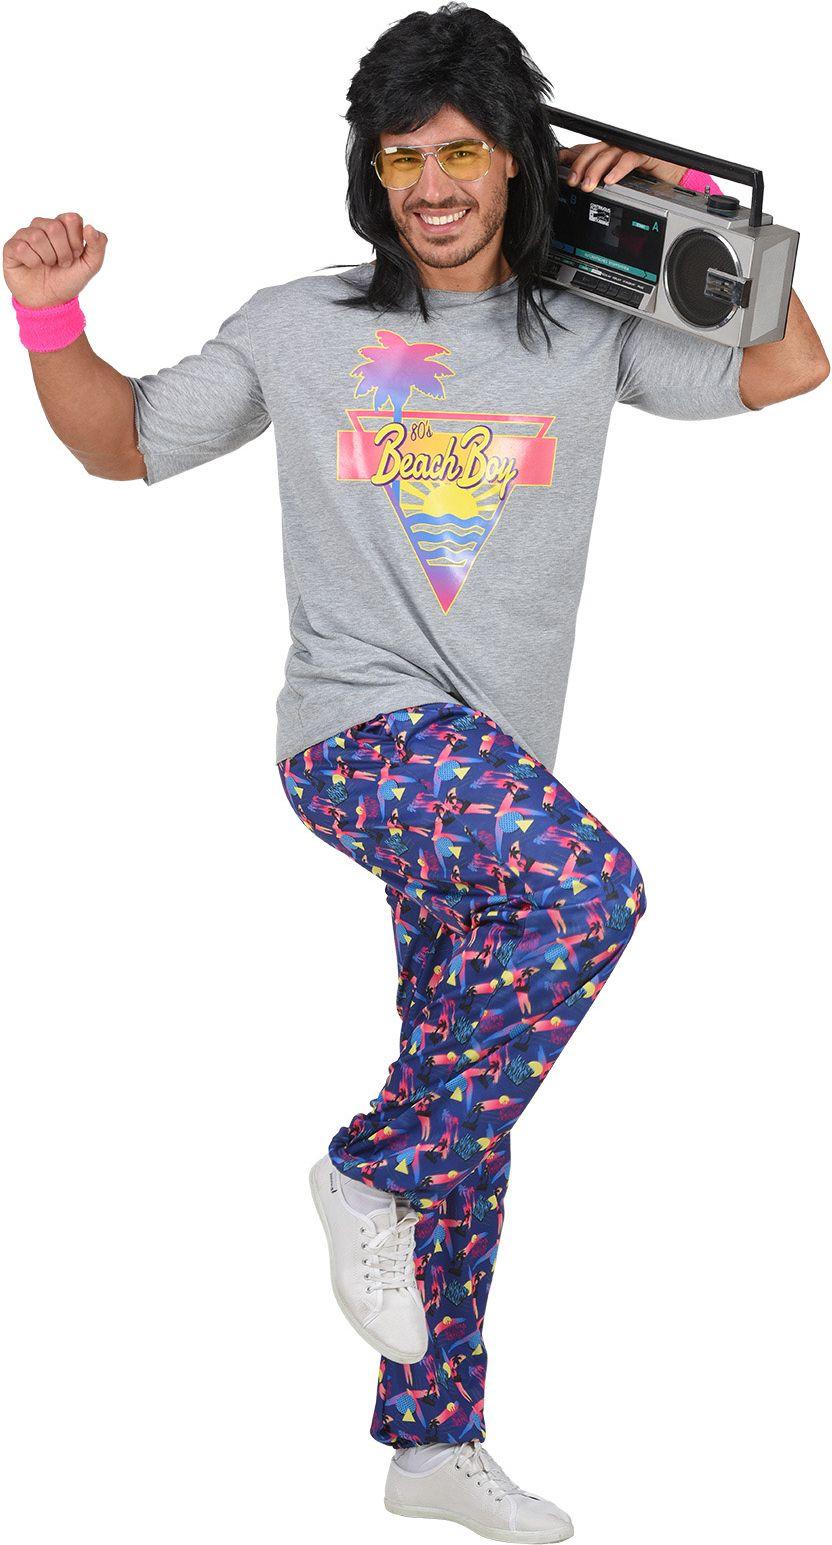 80s beach boy outfit